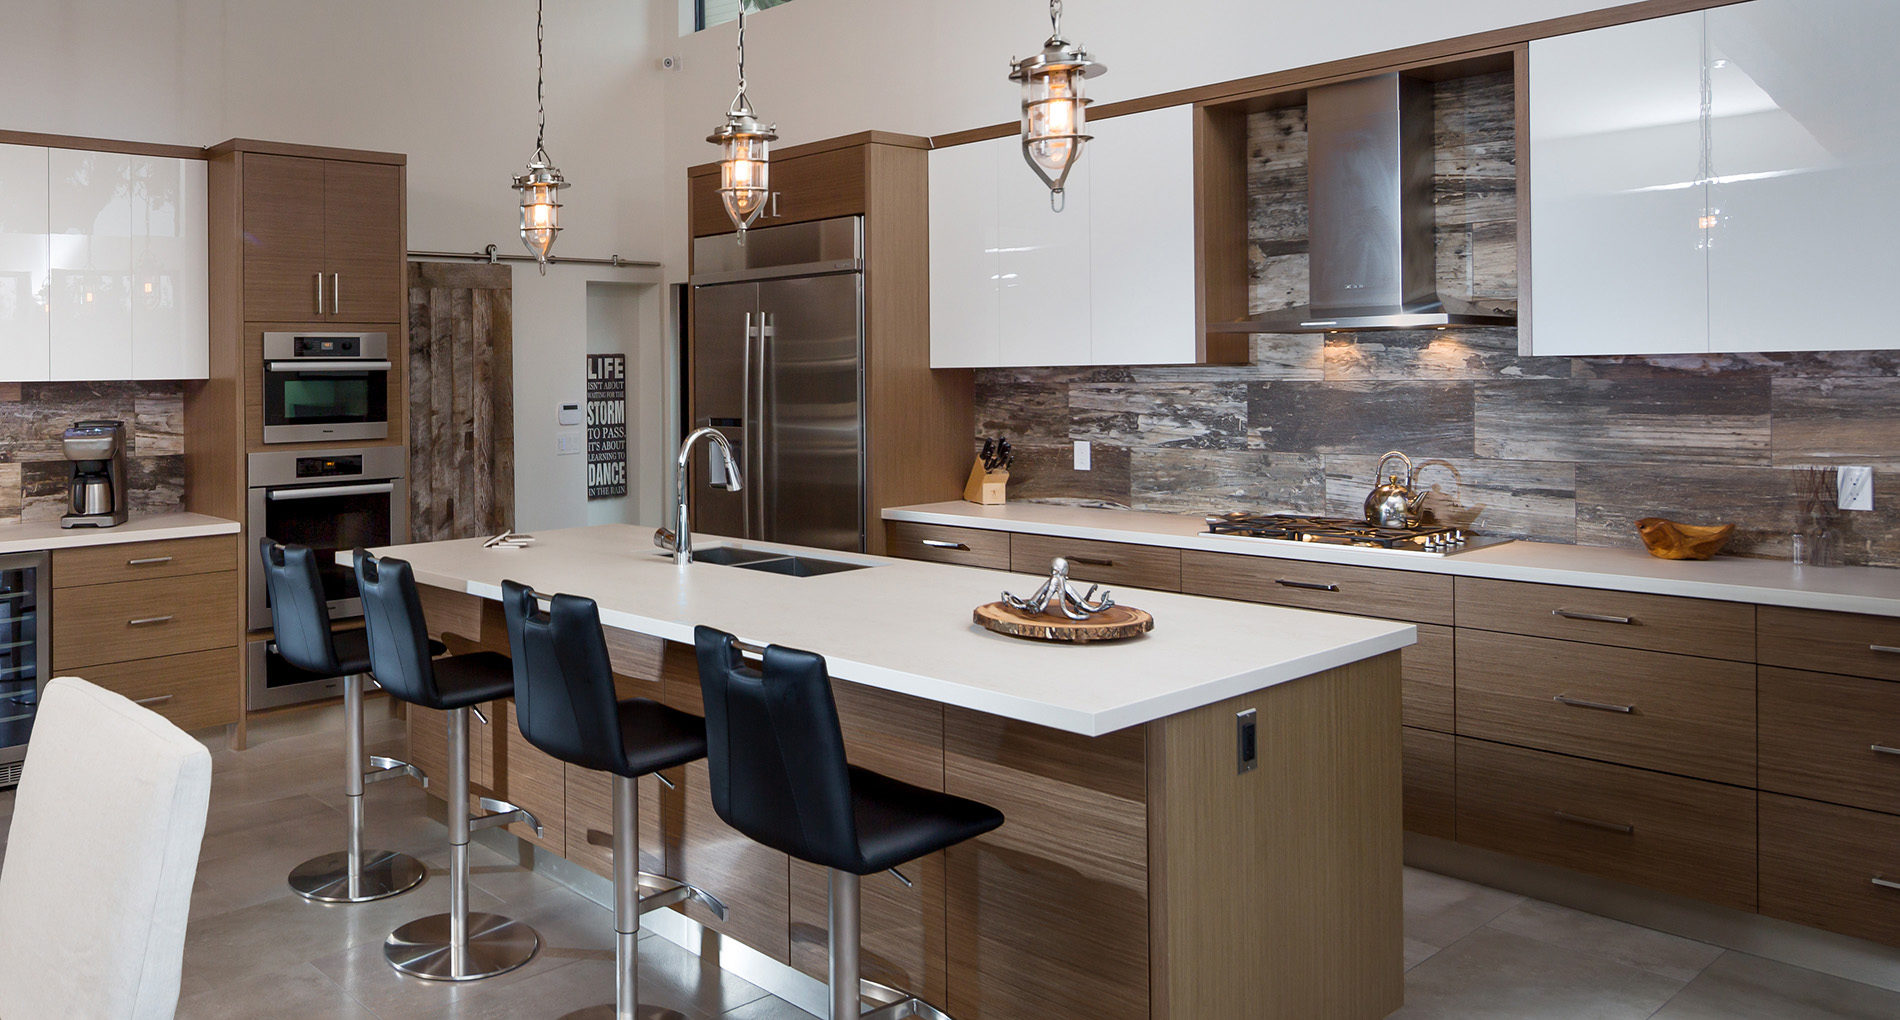 Kitchen Renovation North Island Cliffcustom Slider